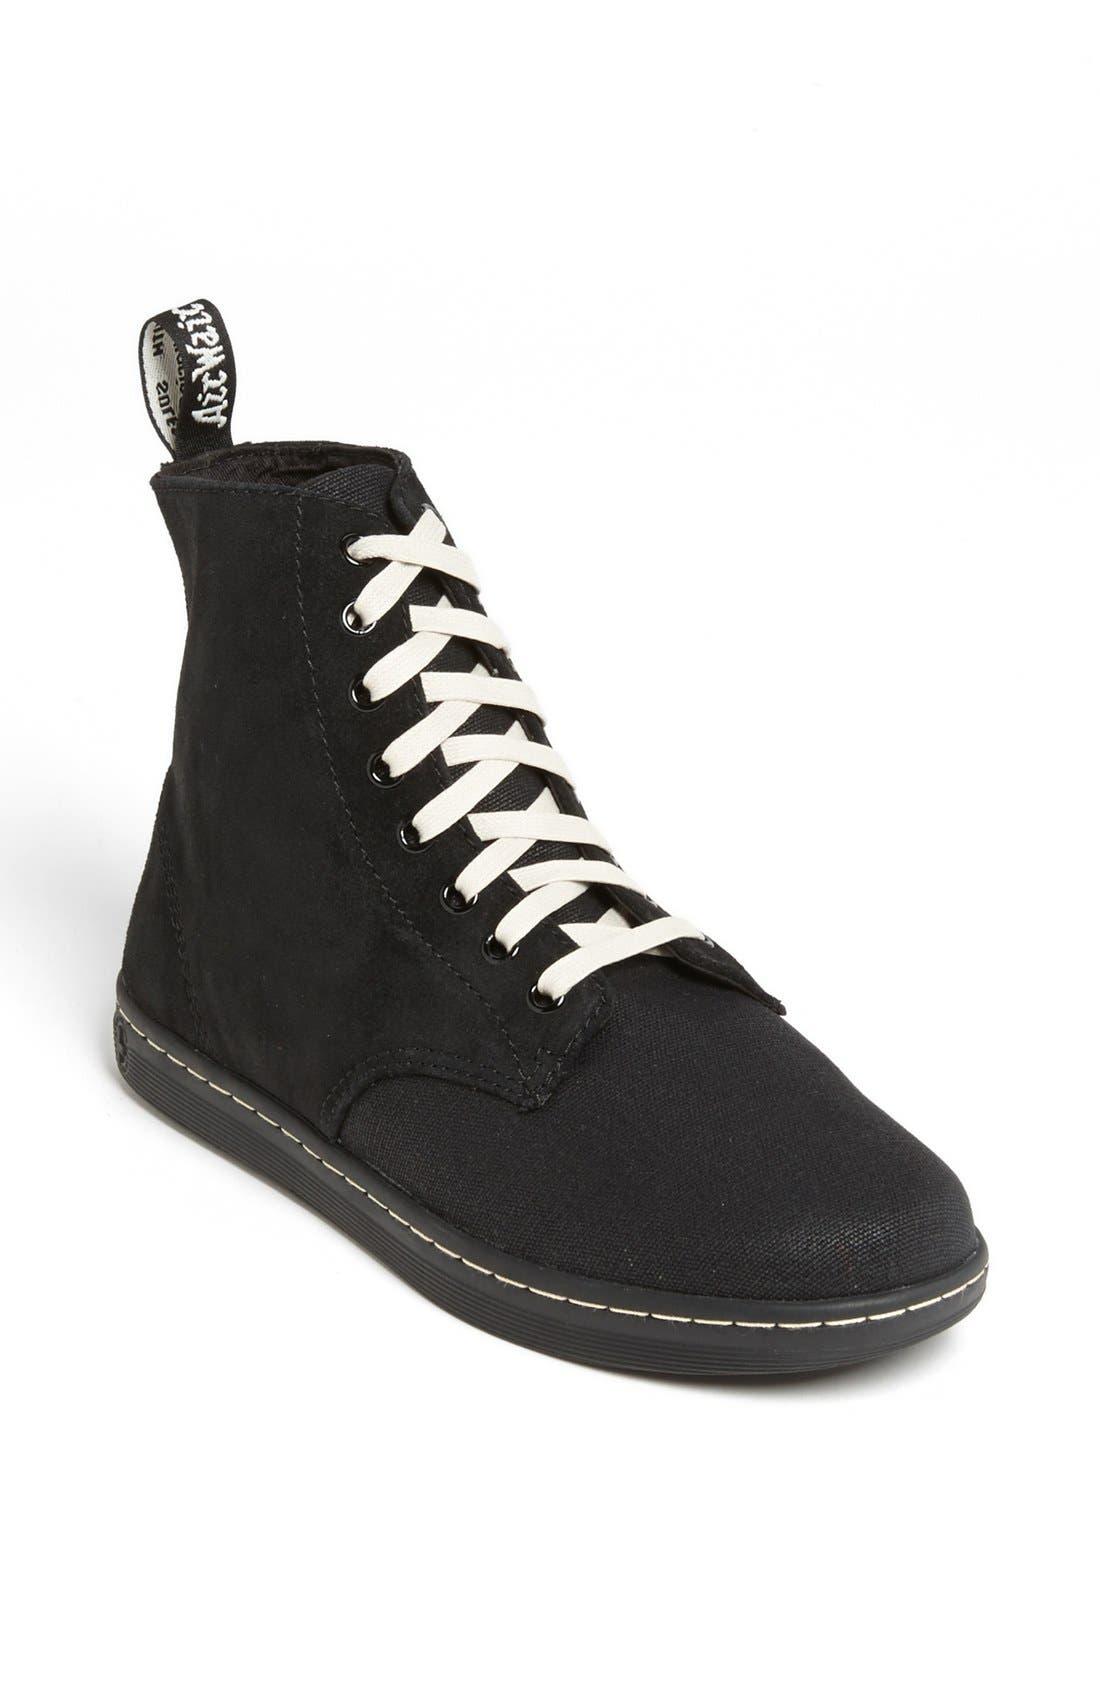 Main Image - Dr. Martens 'Alfie' Sneaker